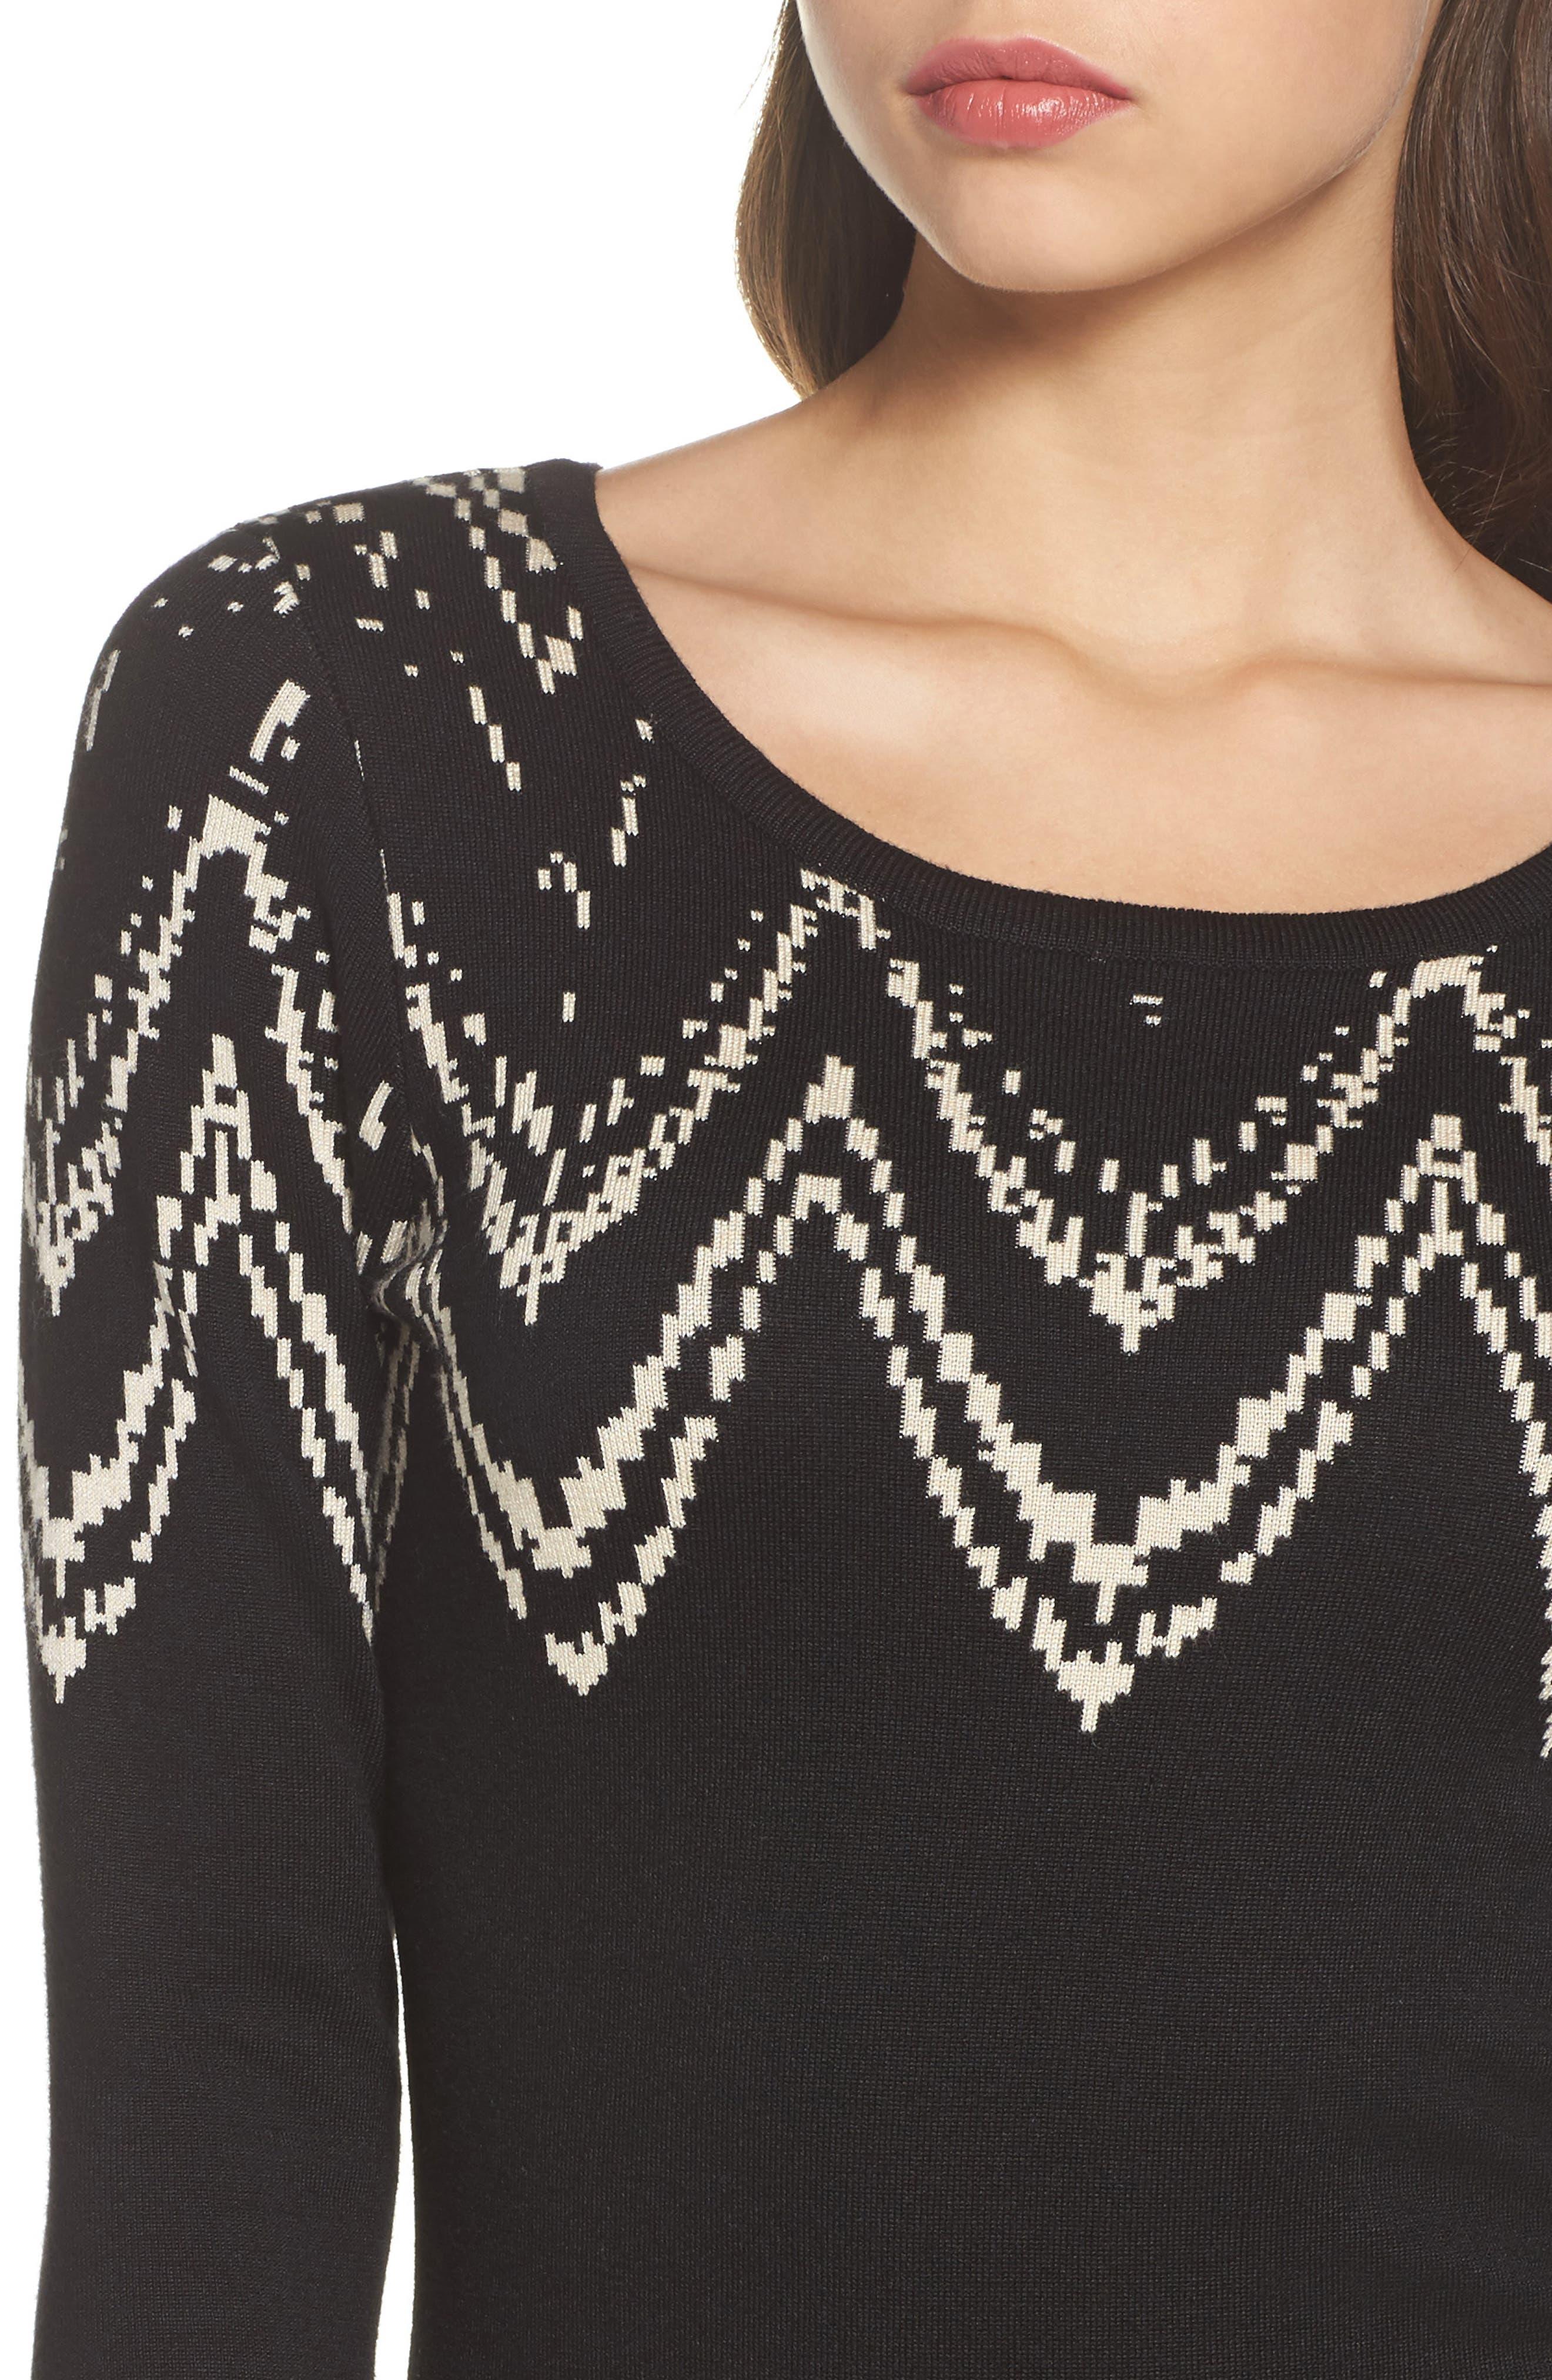 Print Sweater Dress,                             Alternate thumbnail 4, color,                             001